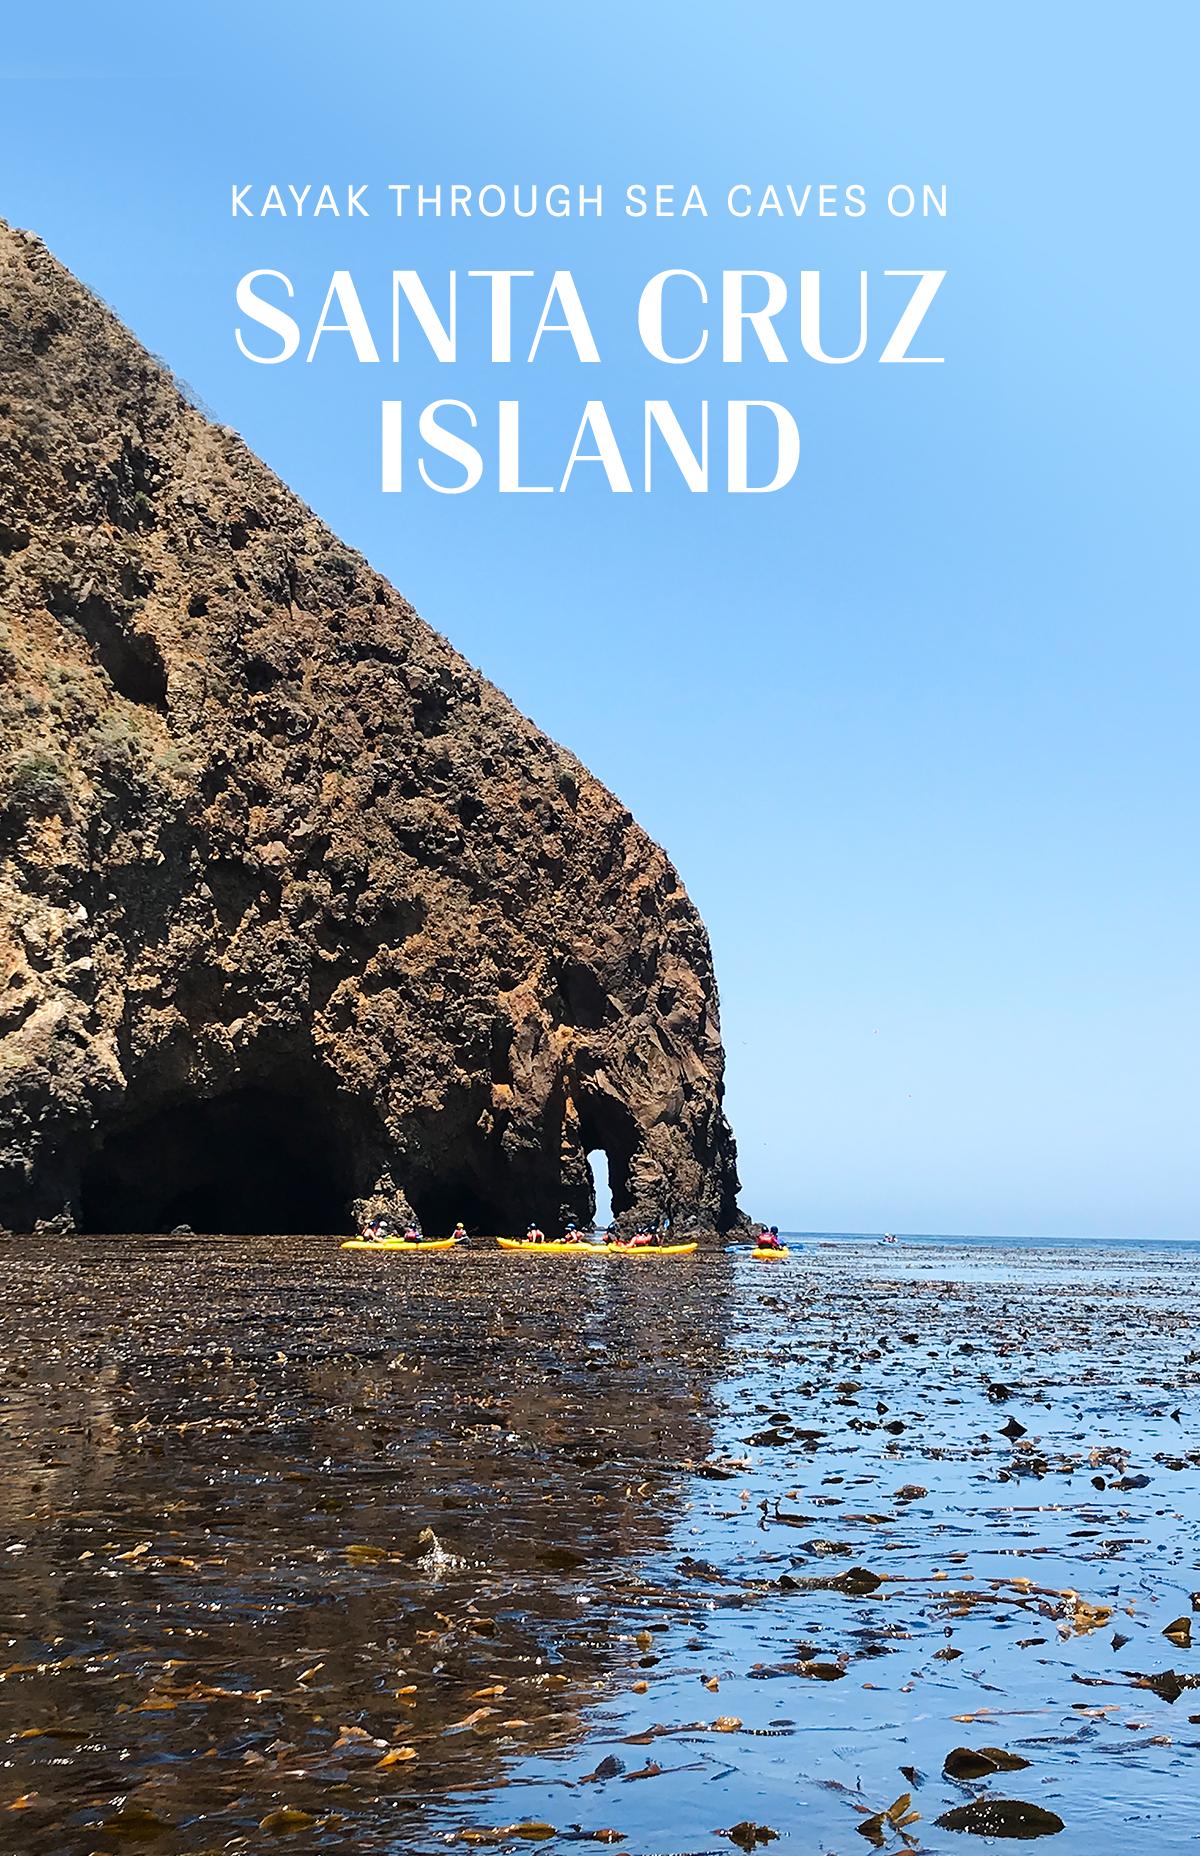 social-chrissihernandez-pin-santa-cruz-island-02.jpg